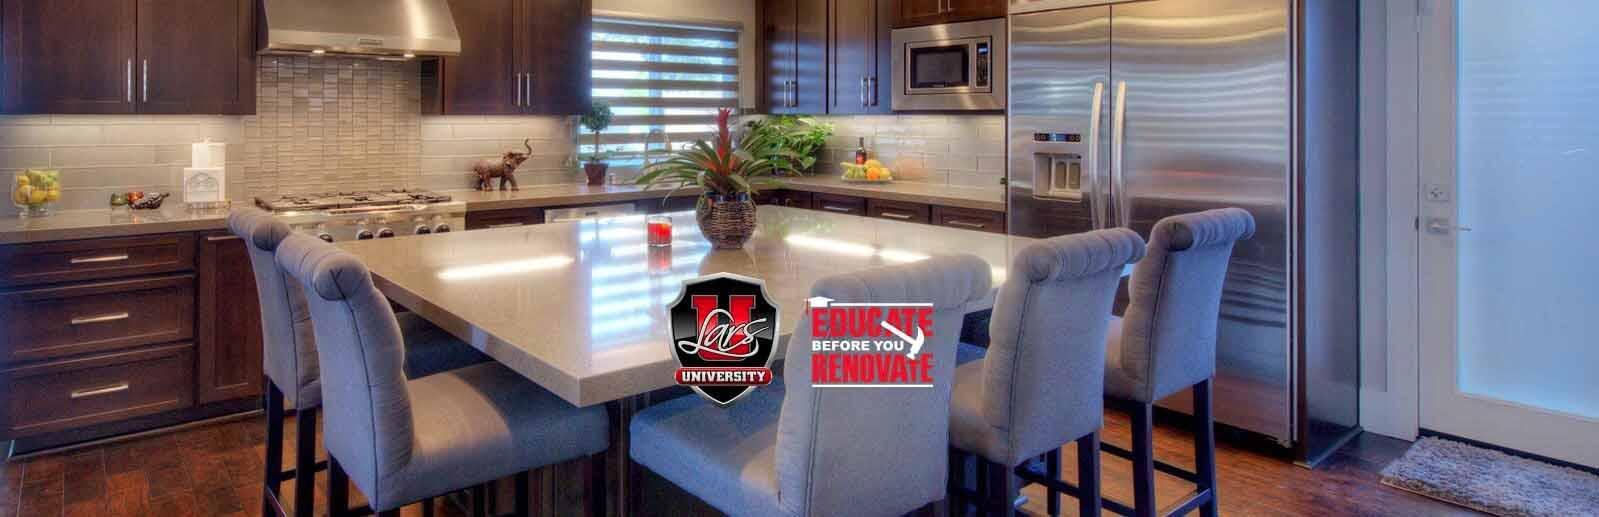 San Diego Remodeling | Home Remodel & Renovations | Lars Remodeling ...